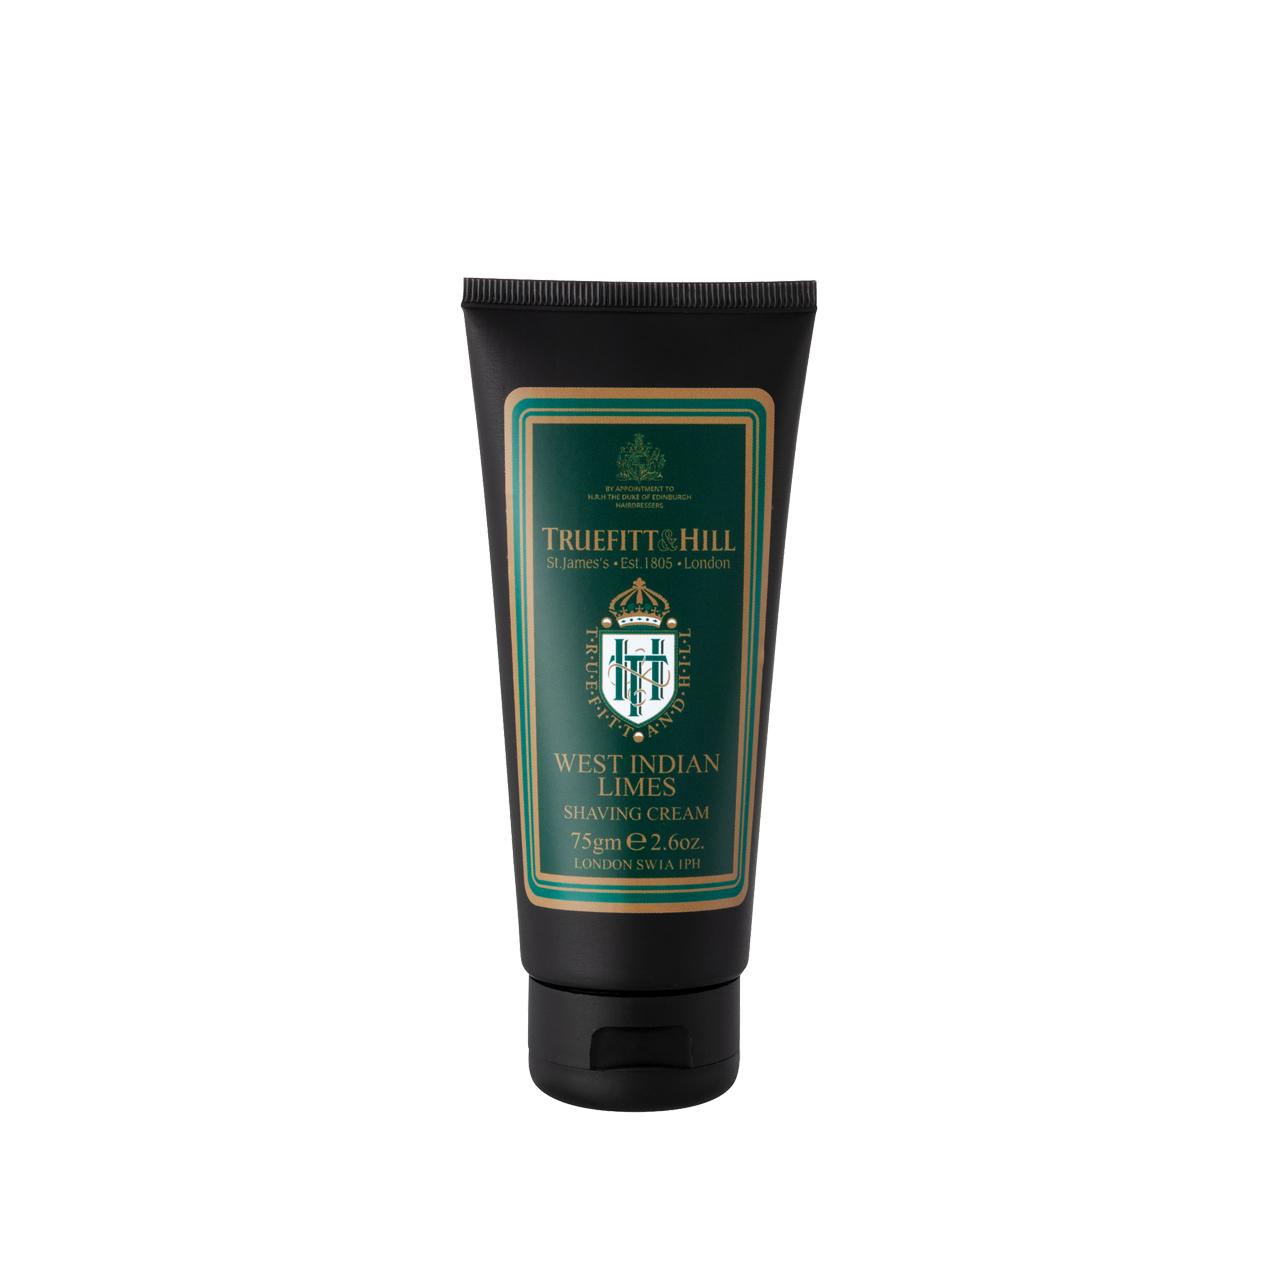 West Indian Limes - Shaving Cream Tube